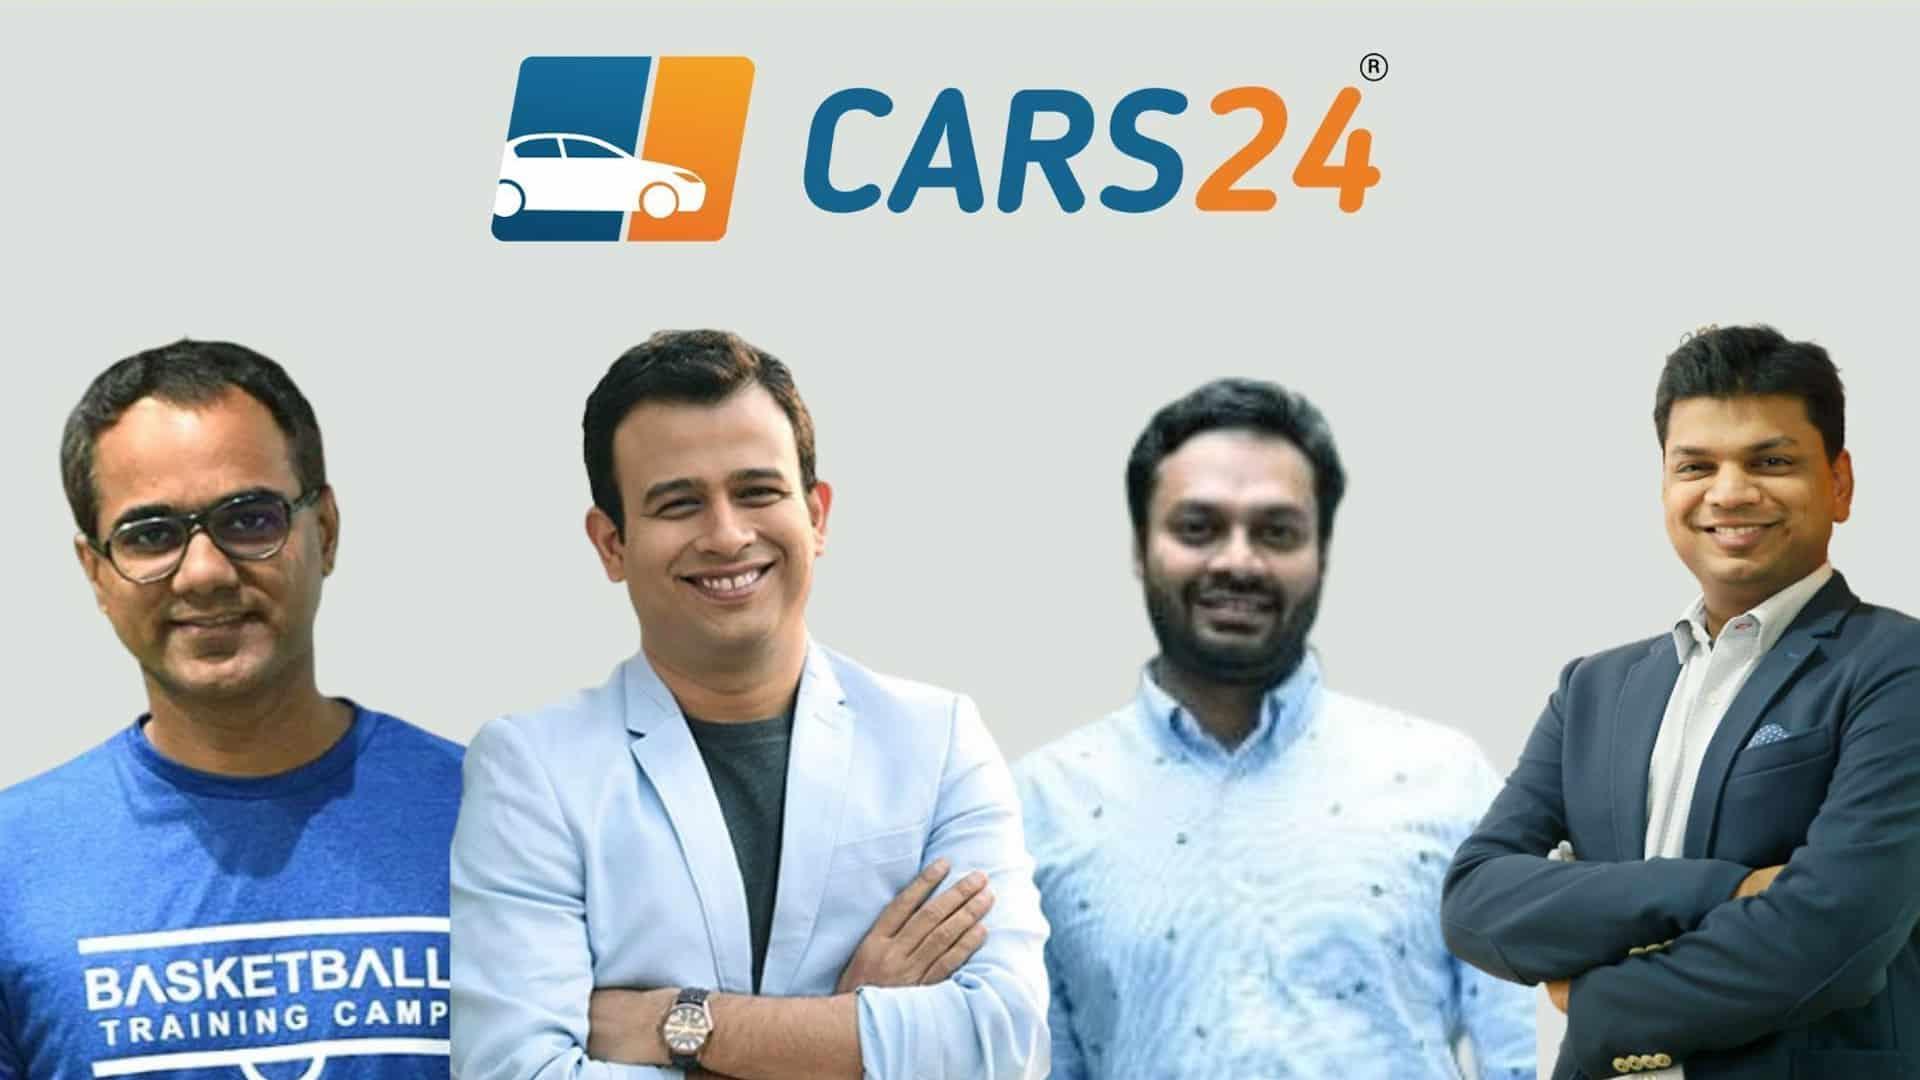 Used vehicle platform CARS24 raises USD 450 mn at USD 1.84 bn valuation